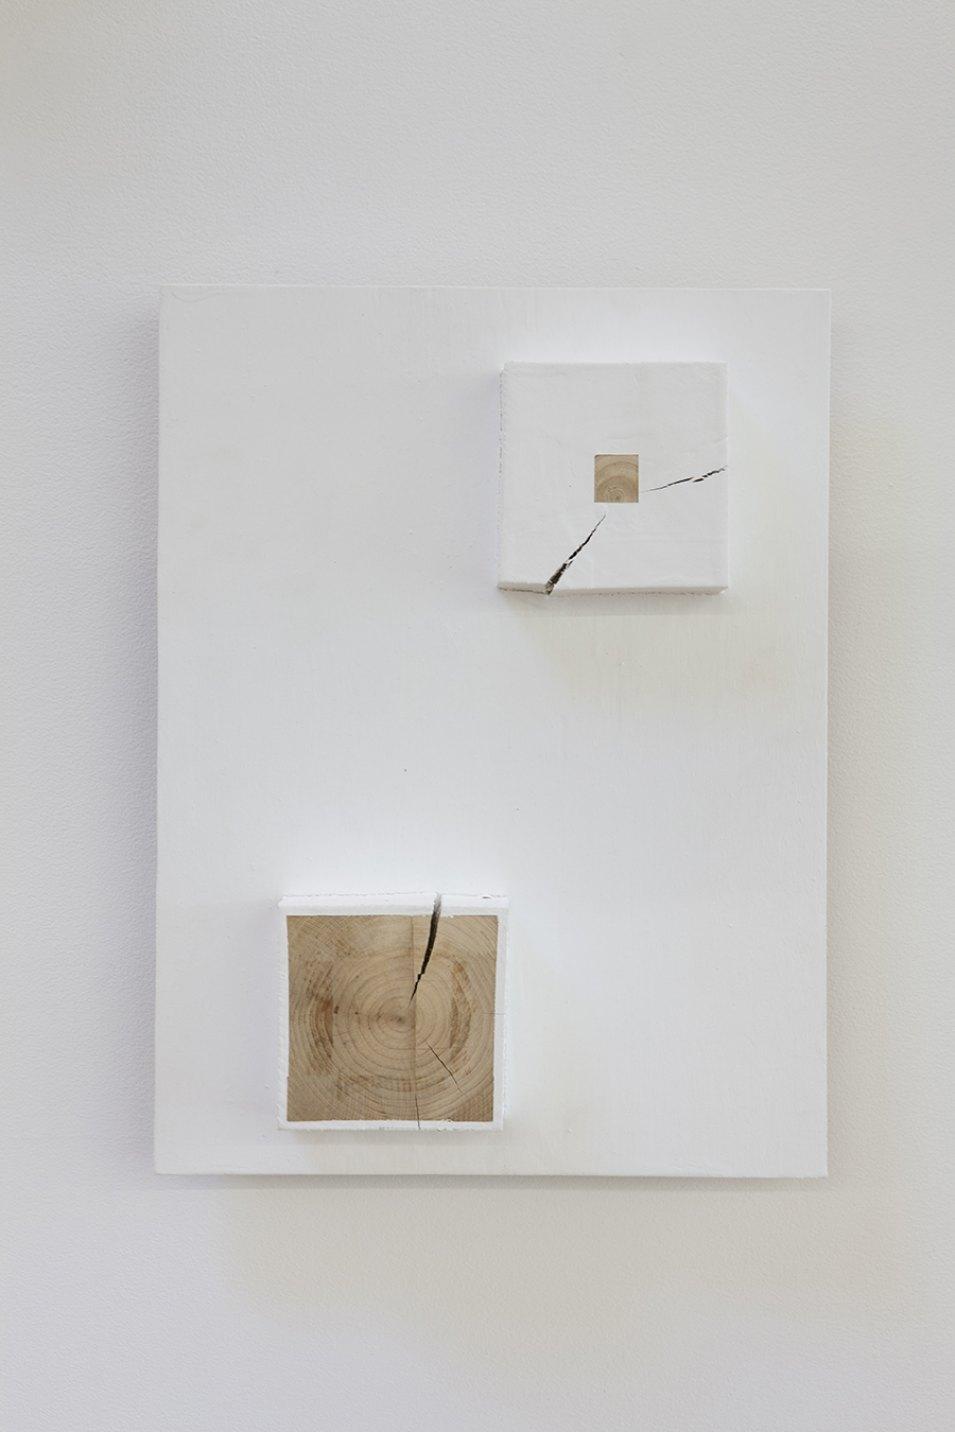 Kishio Suga,<em>Territorialization—1,</em> 2008, plywood, wood, paint, 36,7 × 27,6 × 7,9 cm - Mendes Wood DM